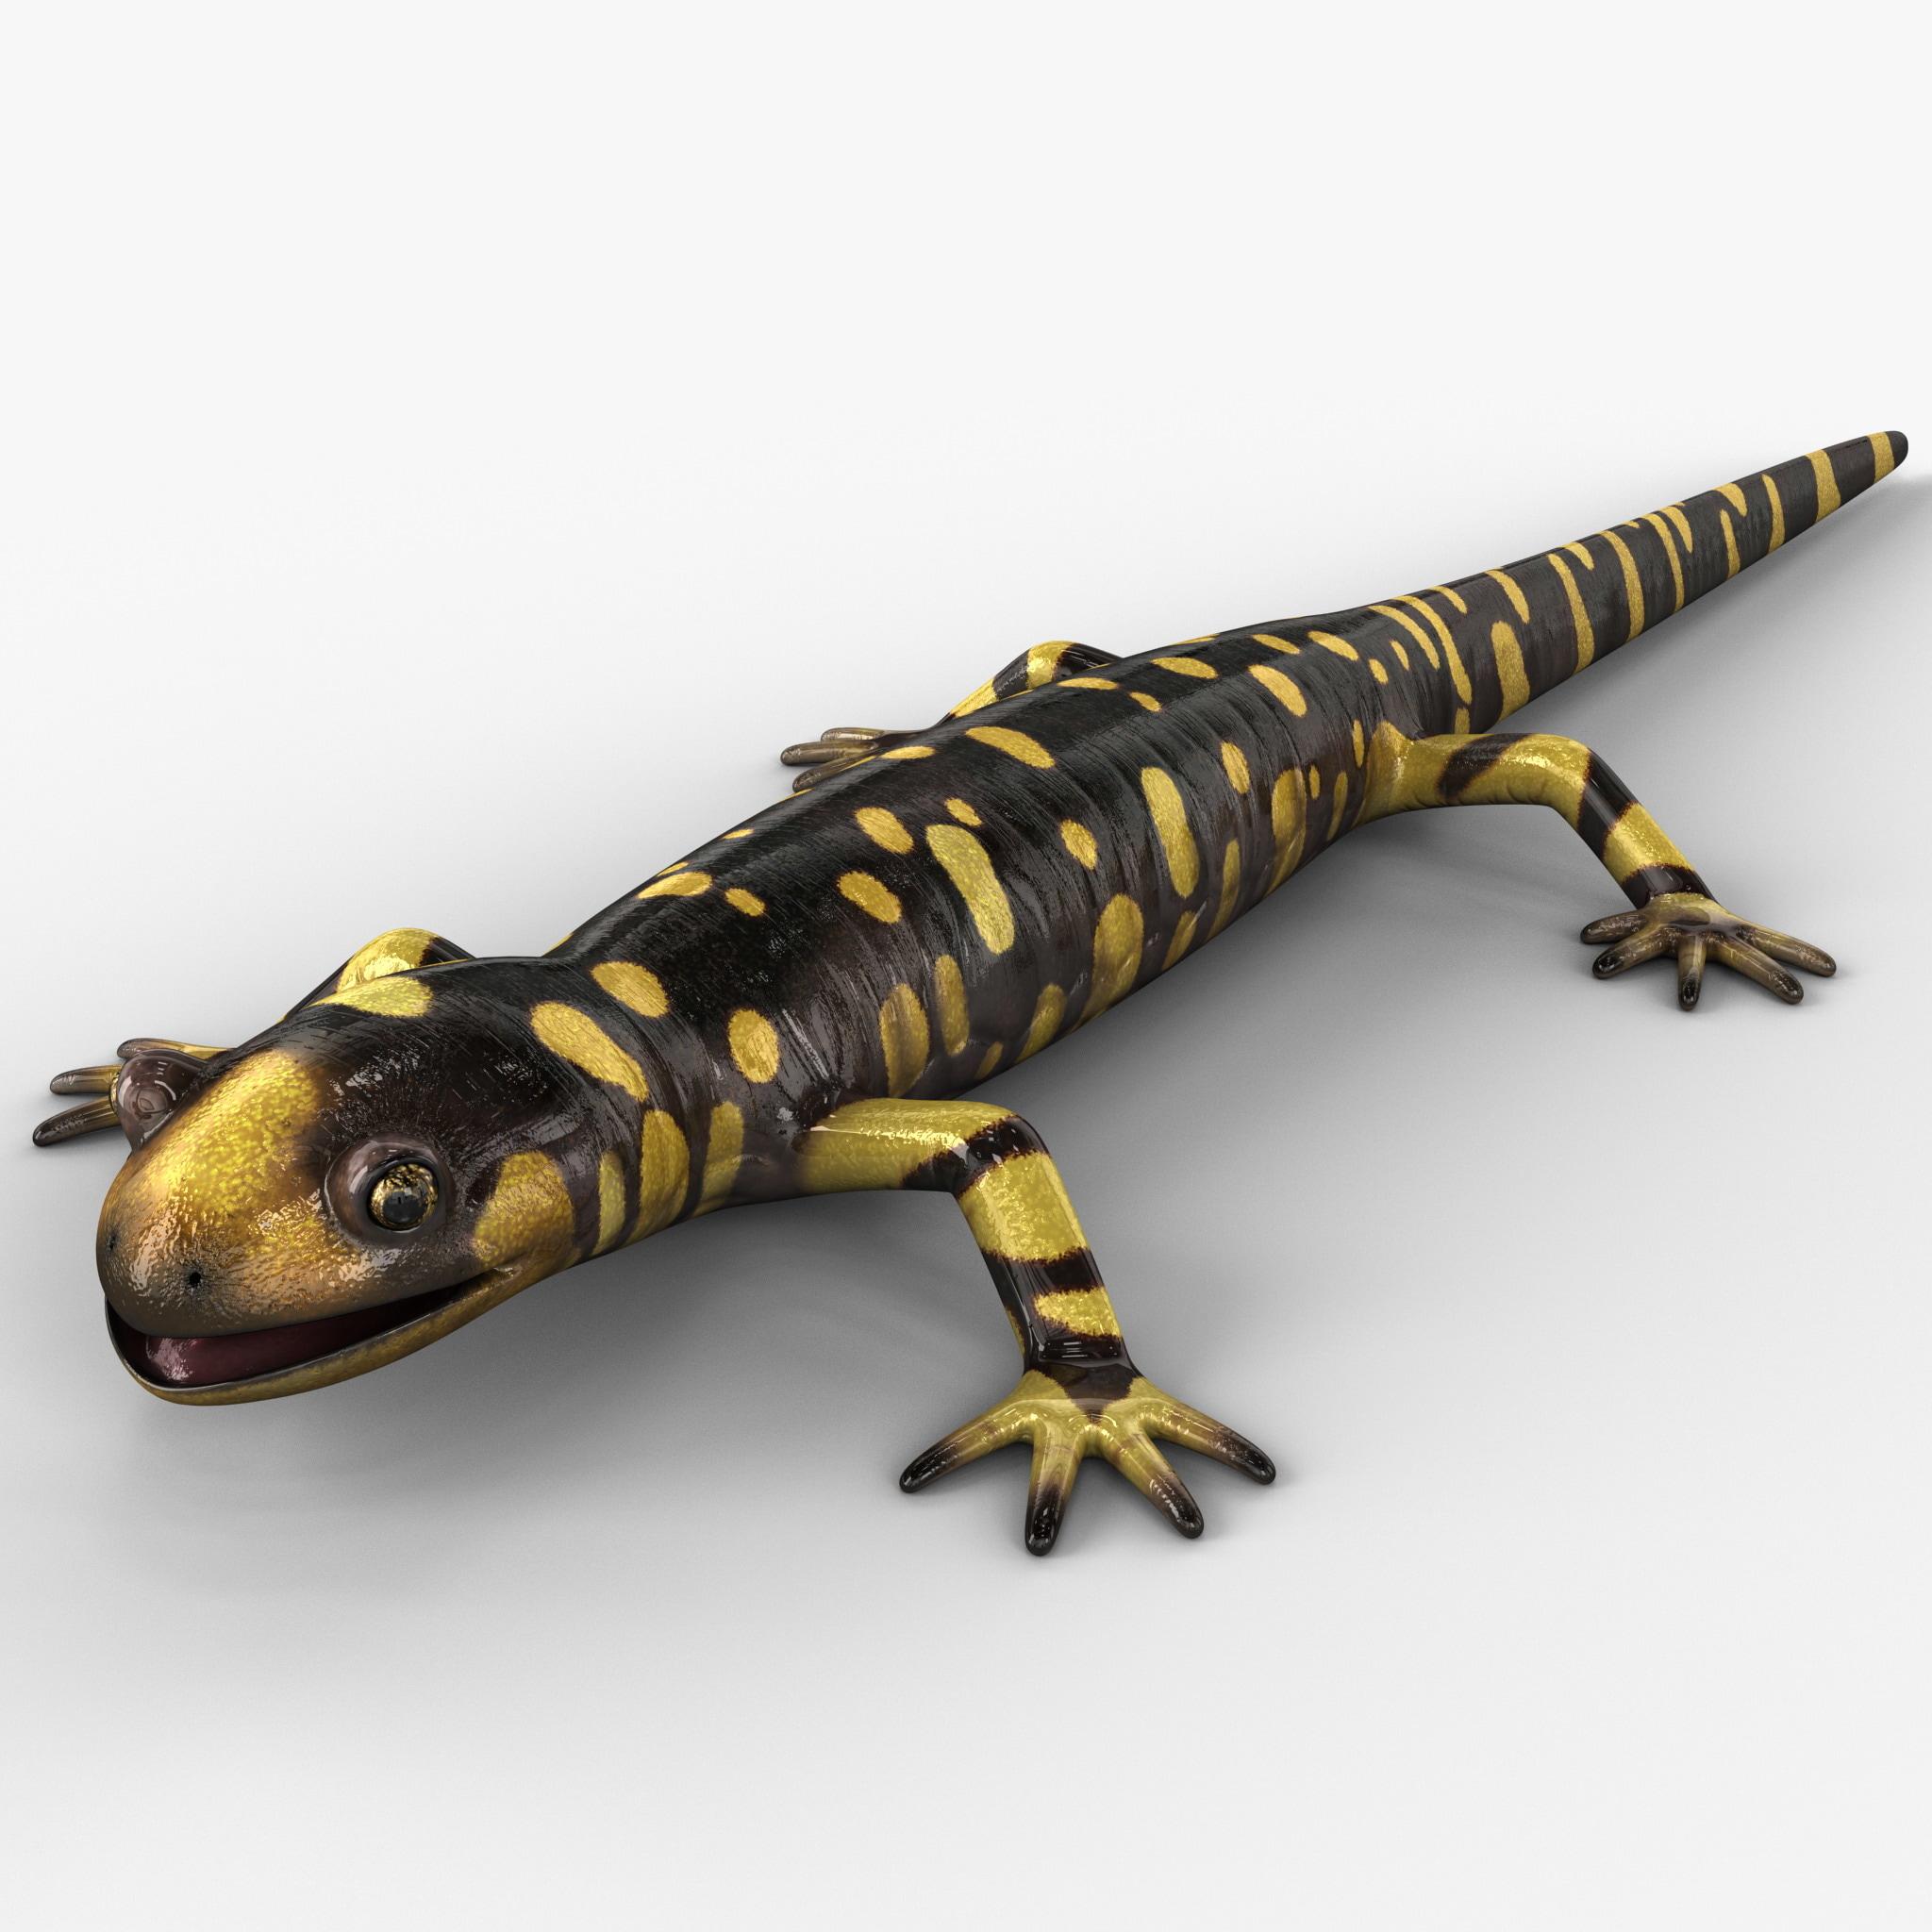 Tiger Salamander Rigged